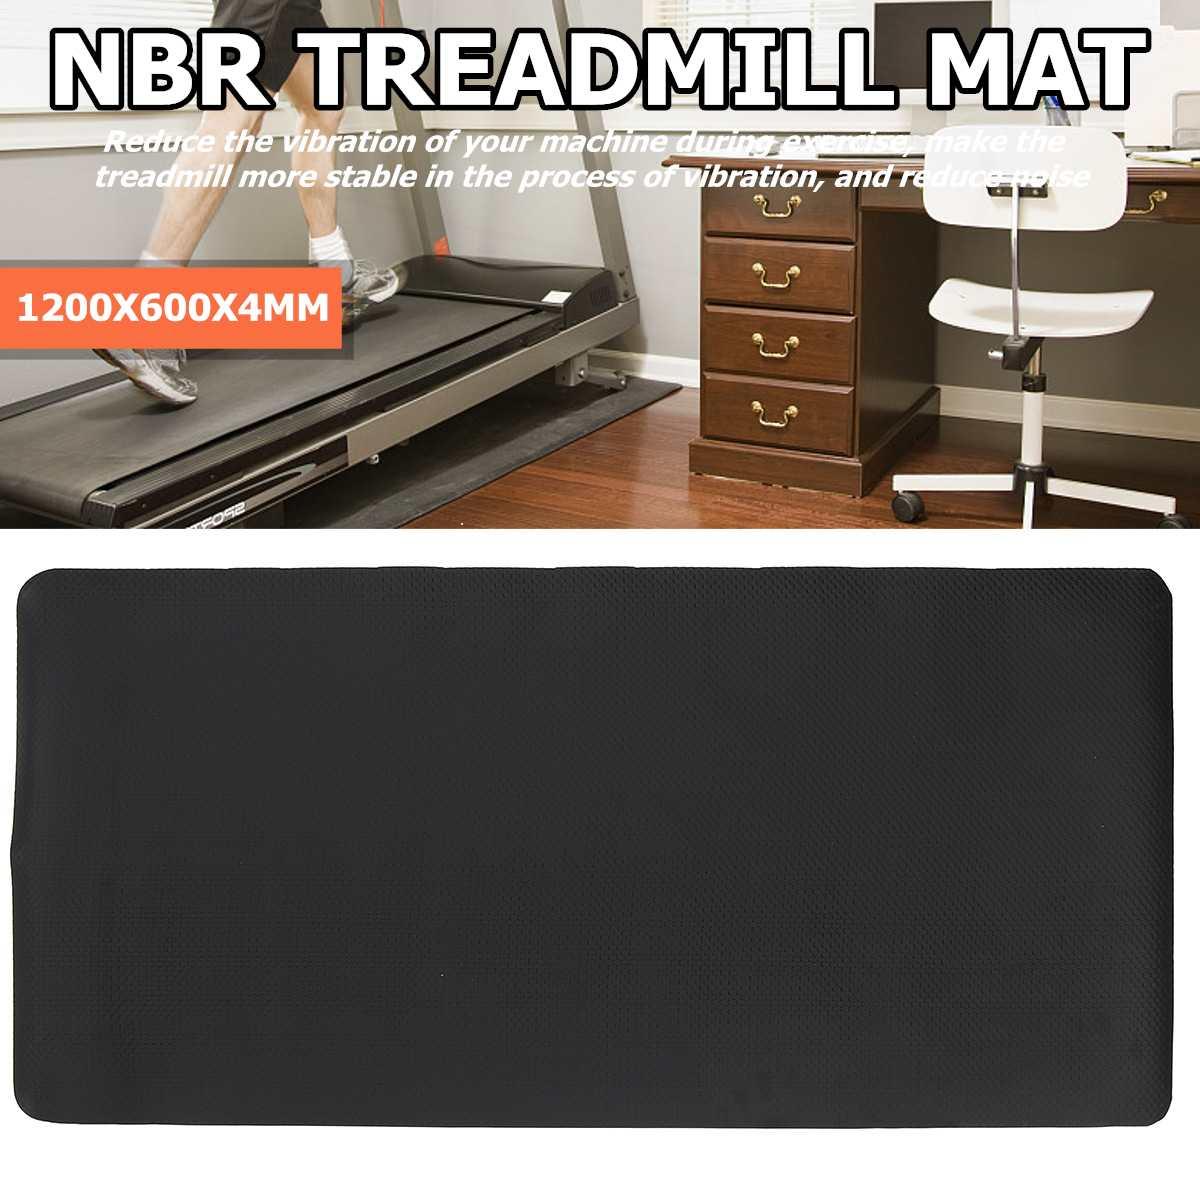 Treadmill Mat NBR Floor Protector Exercise Carpet Pad Shock Sound Proof Mats Treadmill Gym Fitness Equipment Mat 1200*600*4MM